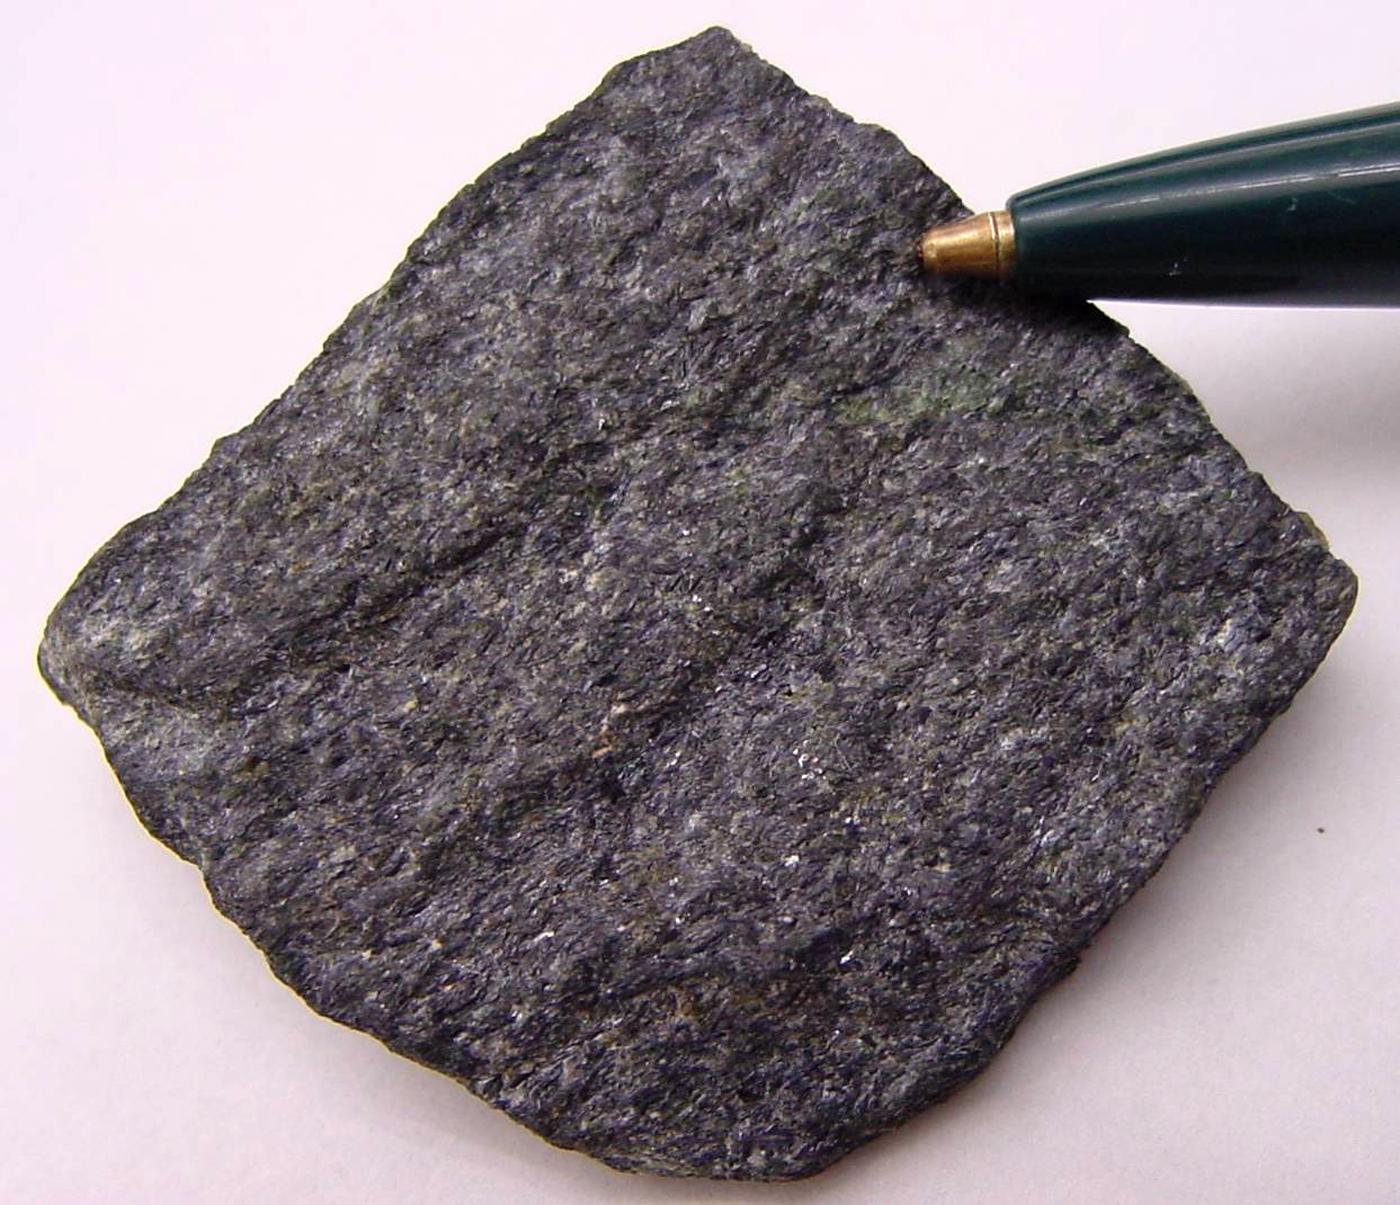 File:Glaucophane-lawsonite blueschist, Marin County CA.jpg ... |Glaucophane Mineral